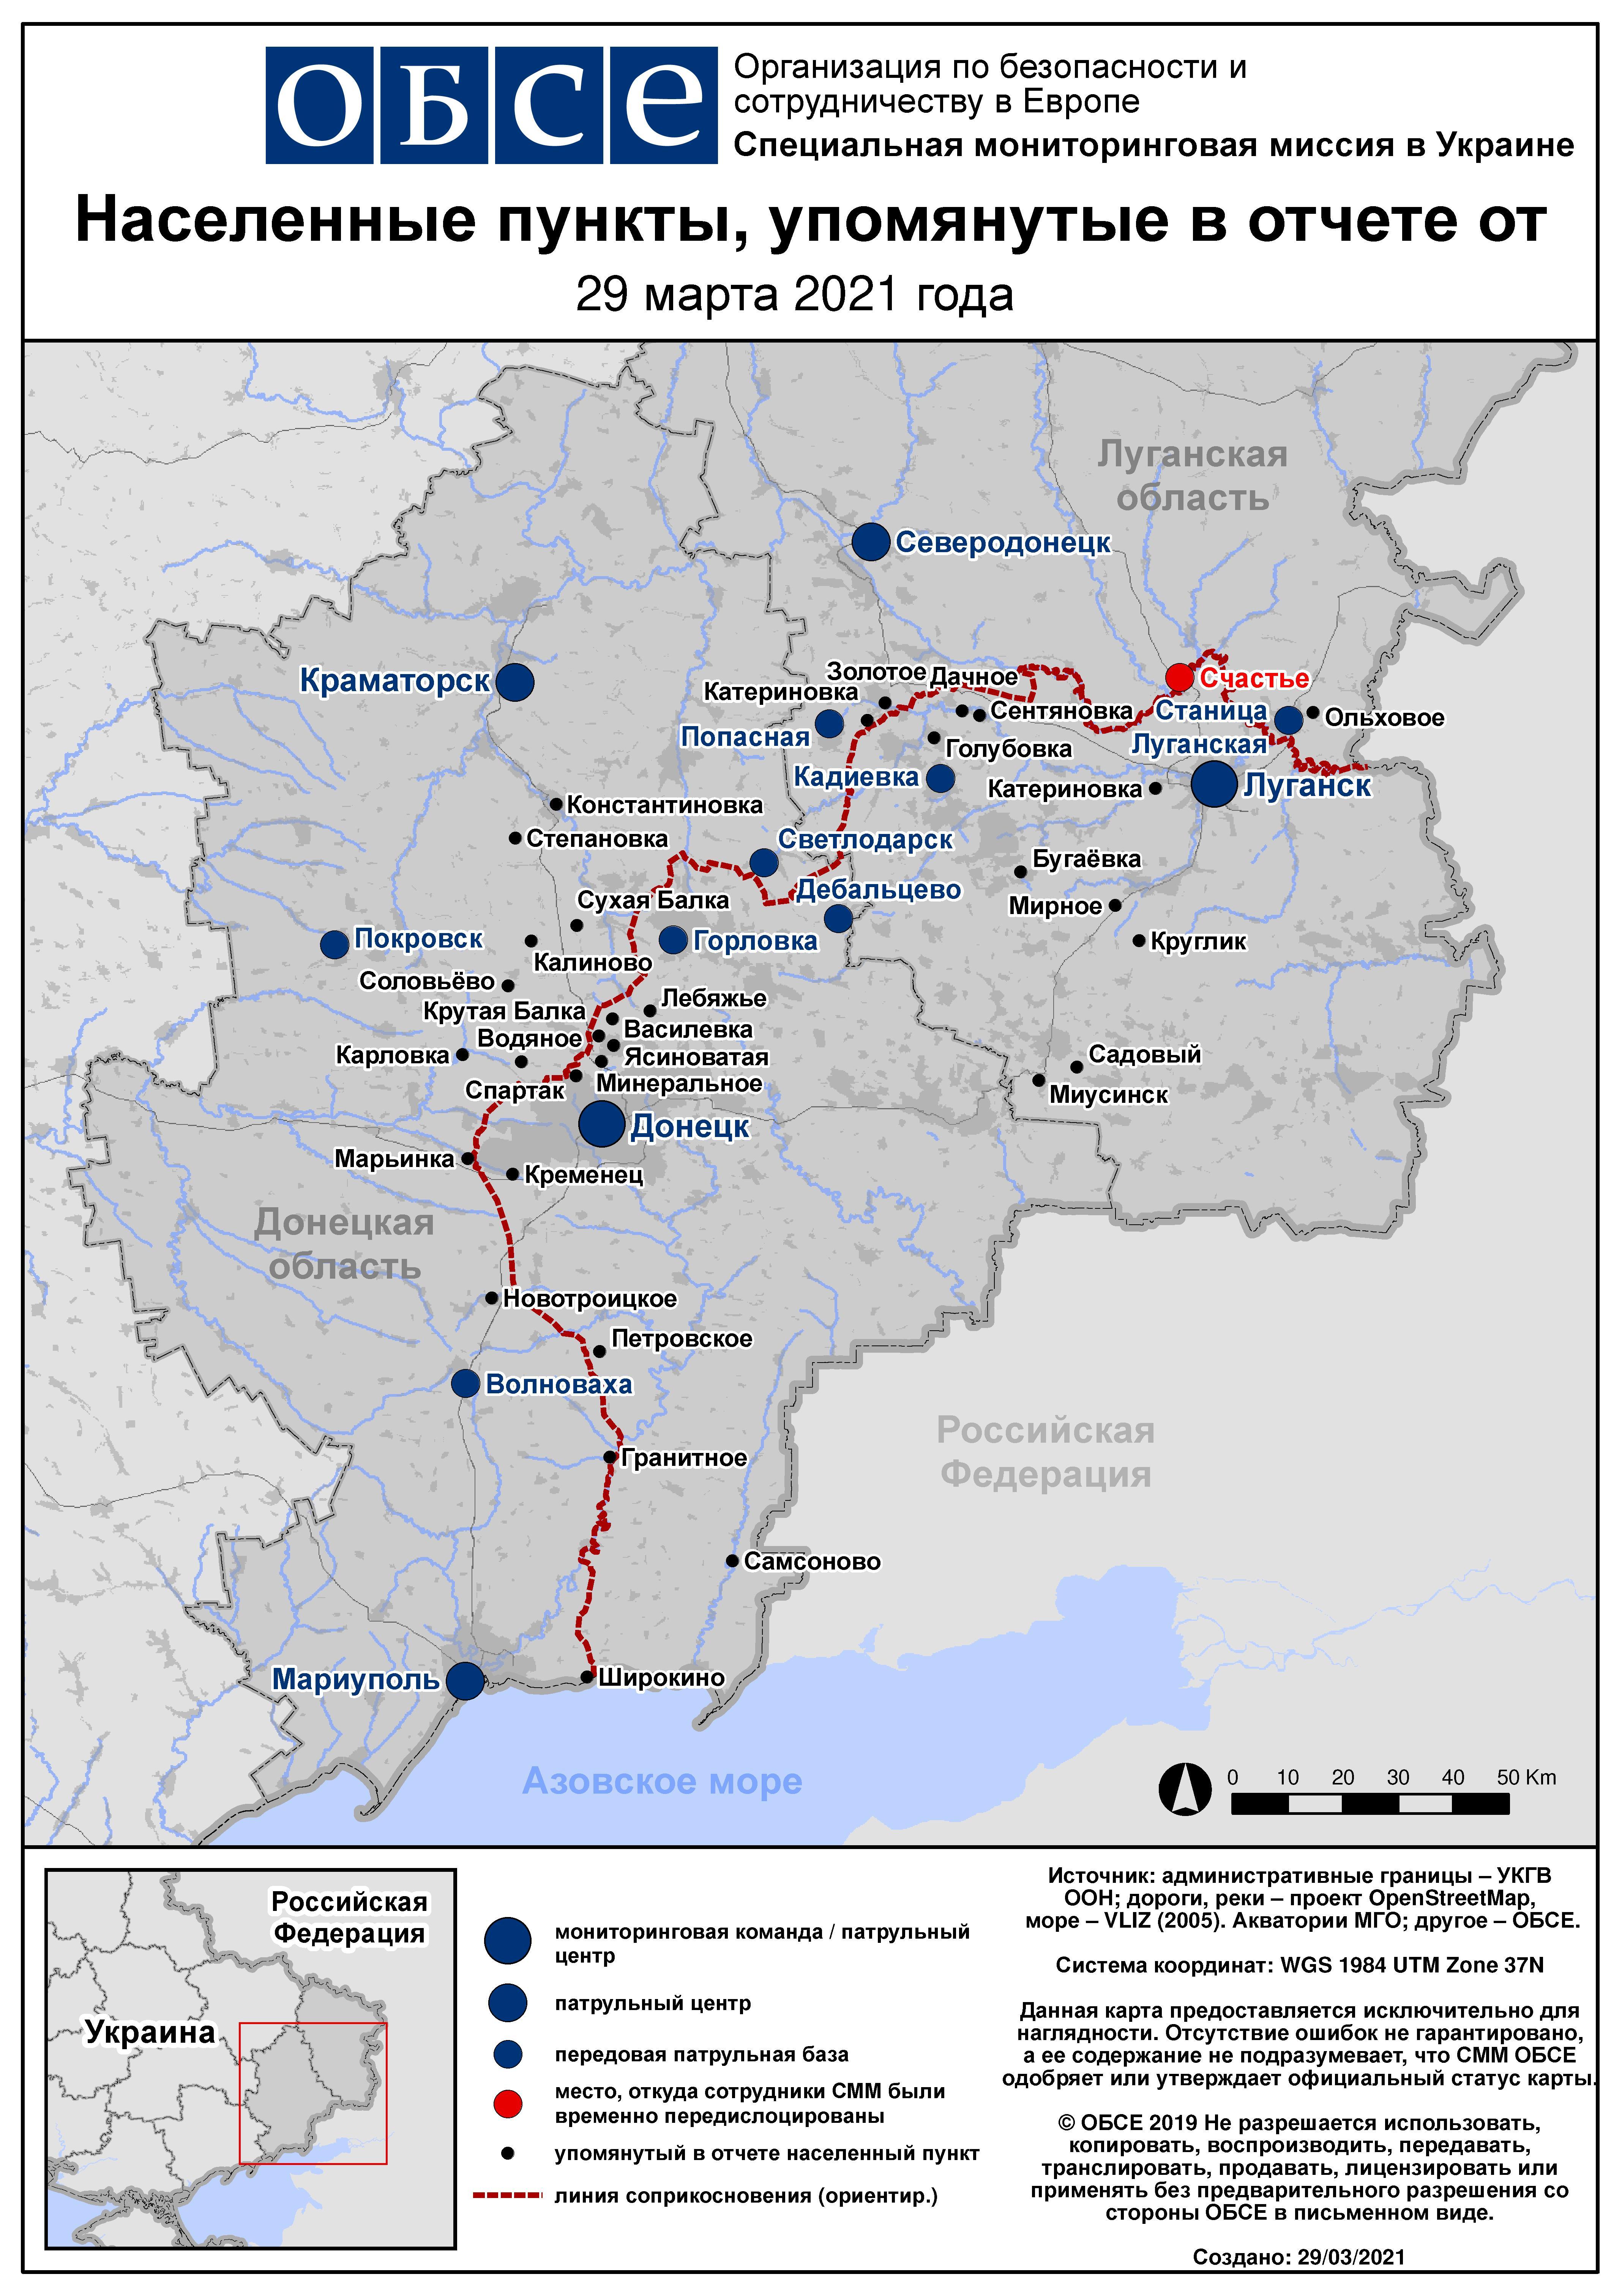 map_settlements--2021-03-28